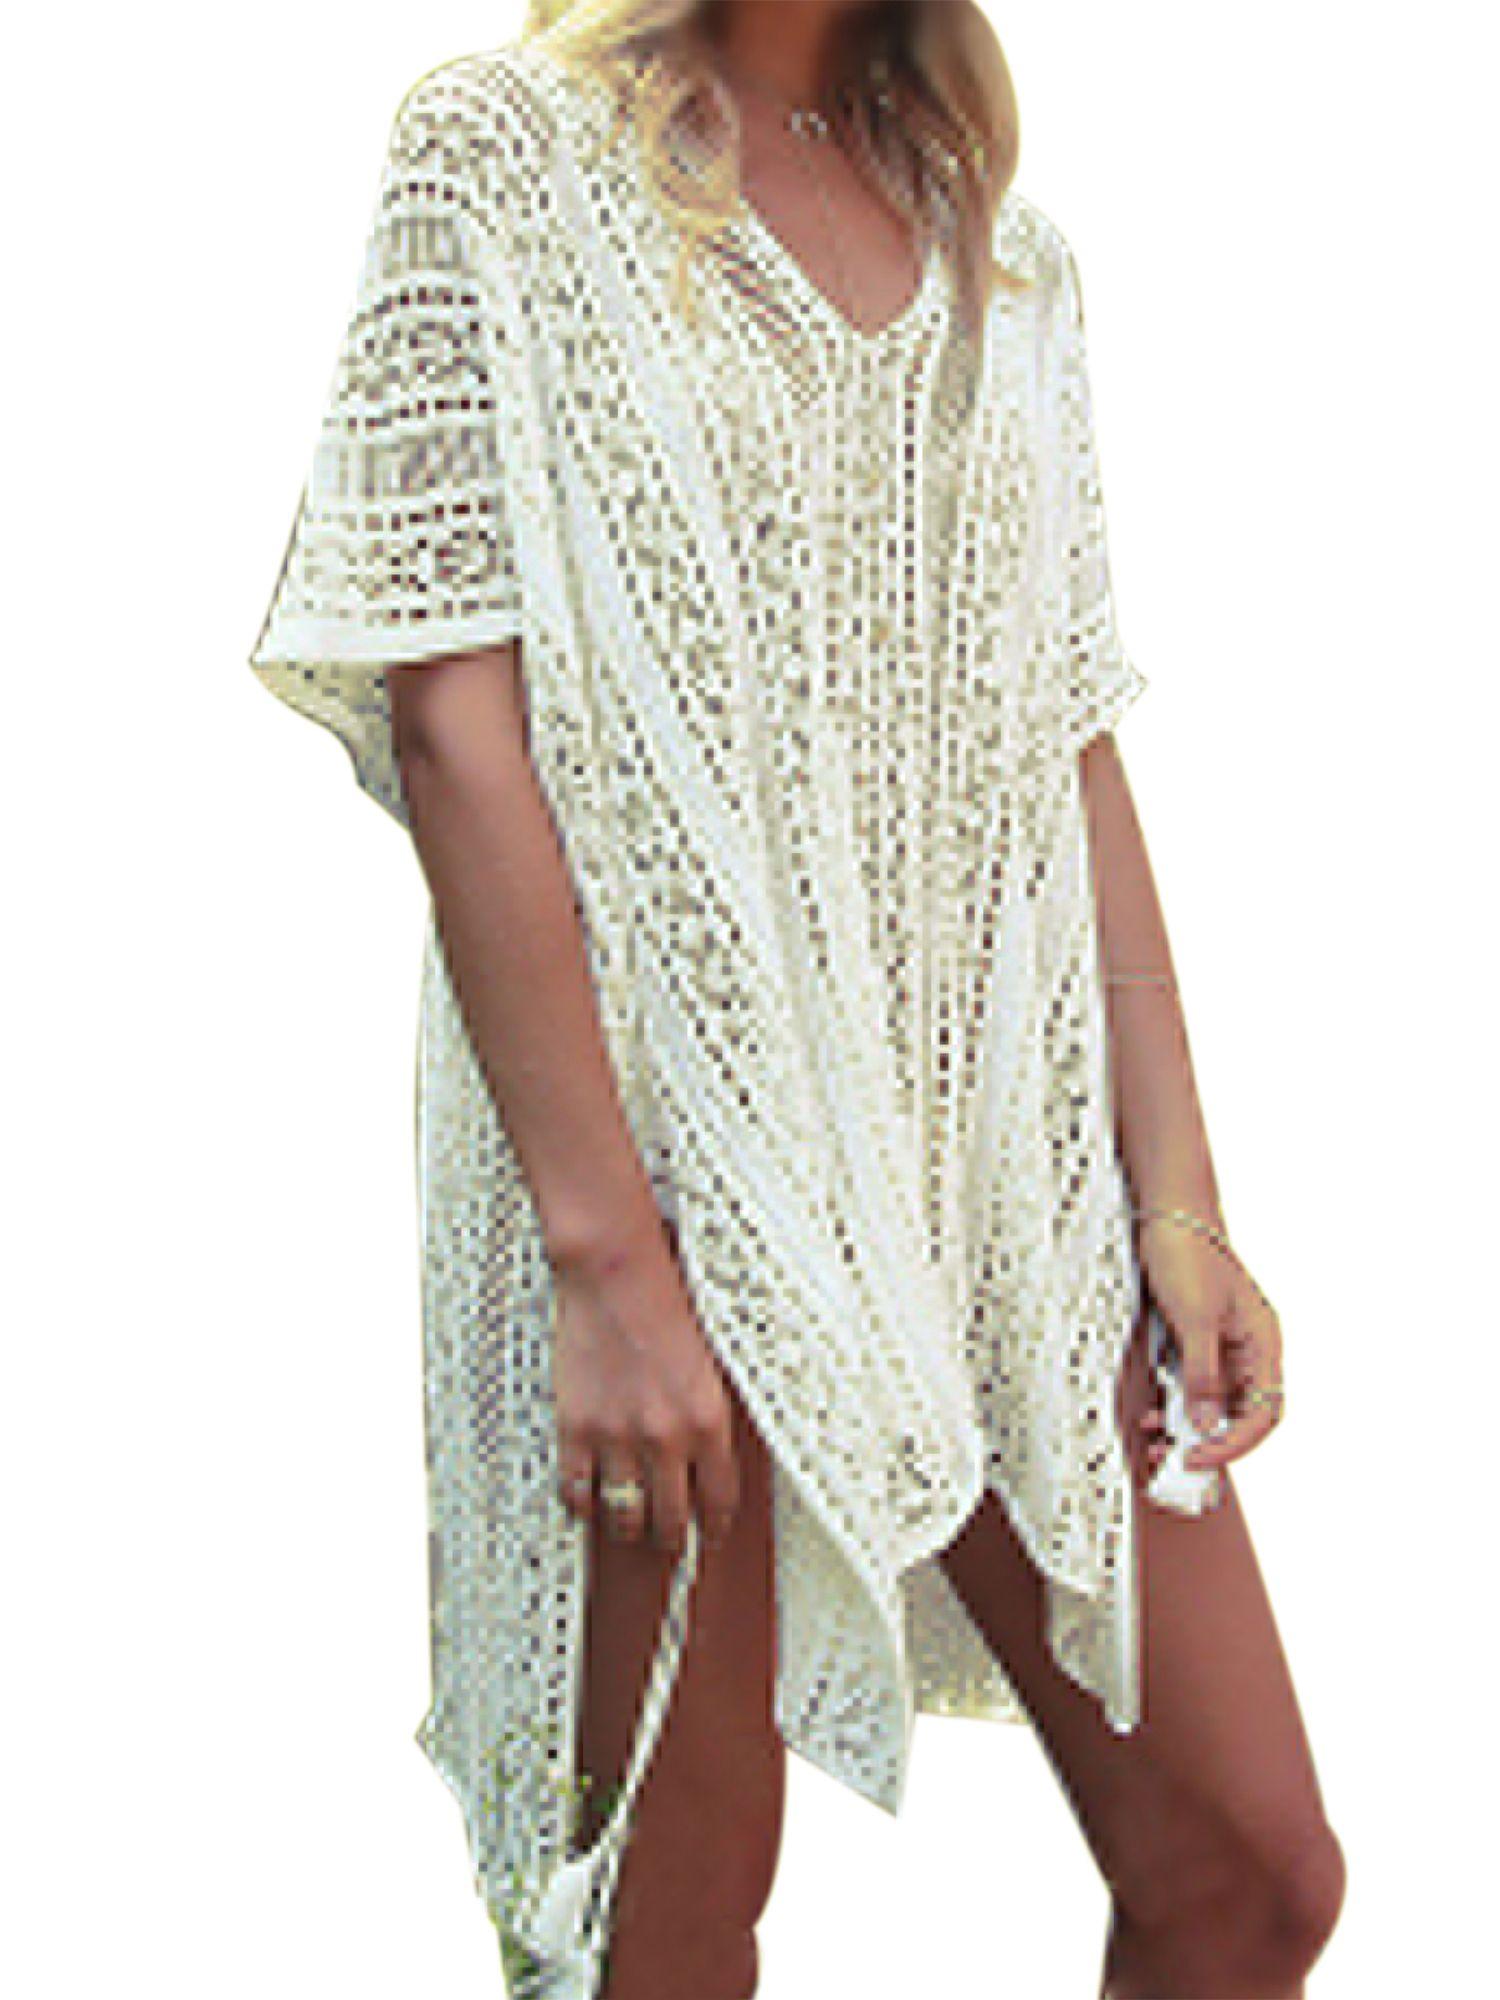 53b3fe8c90 Swim Cover ups Women Knit Lace Crochet Bikini Beachwear V-neck Hollow Out  Loose Beach Dress Tops Summer Bathing Suit Crochet